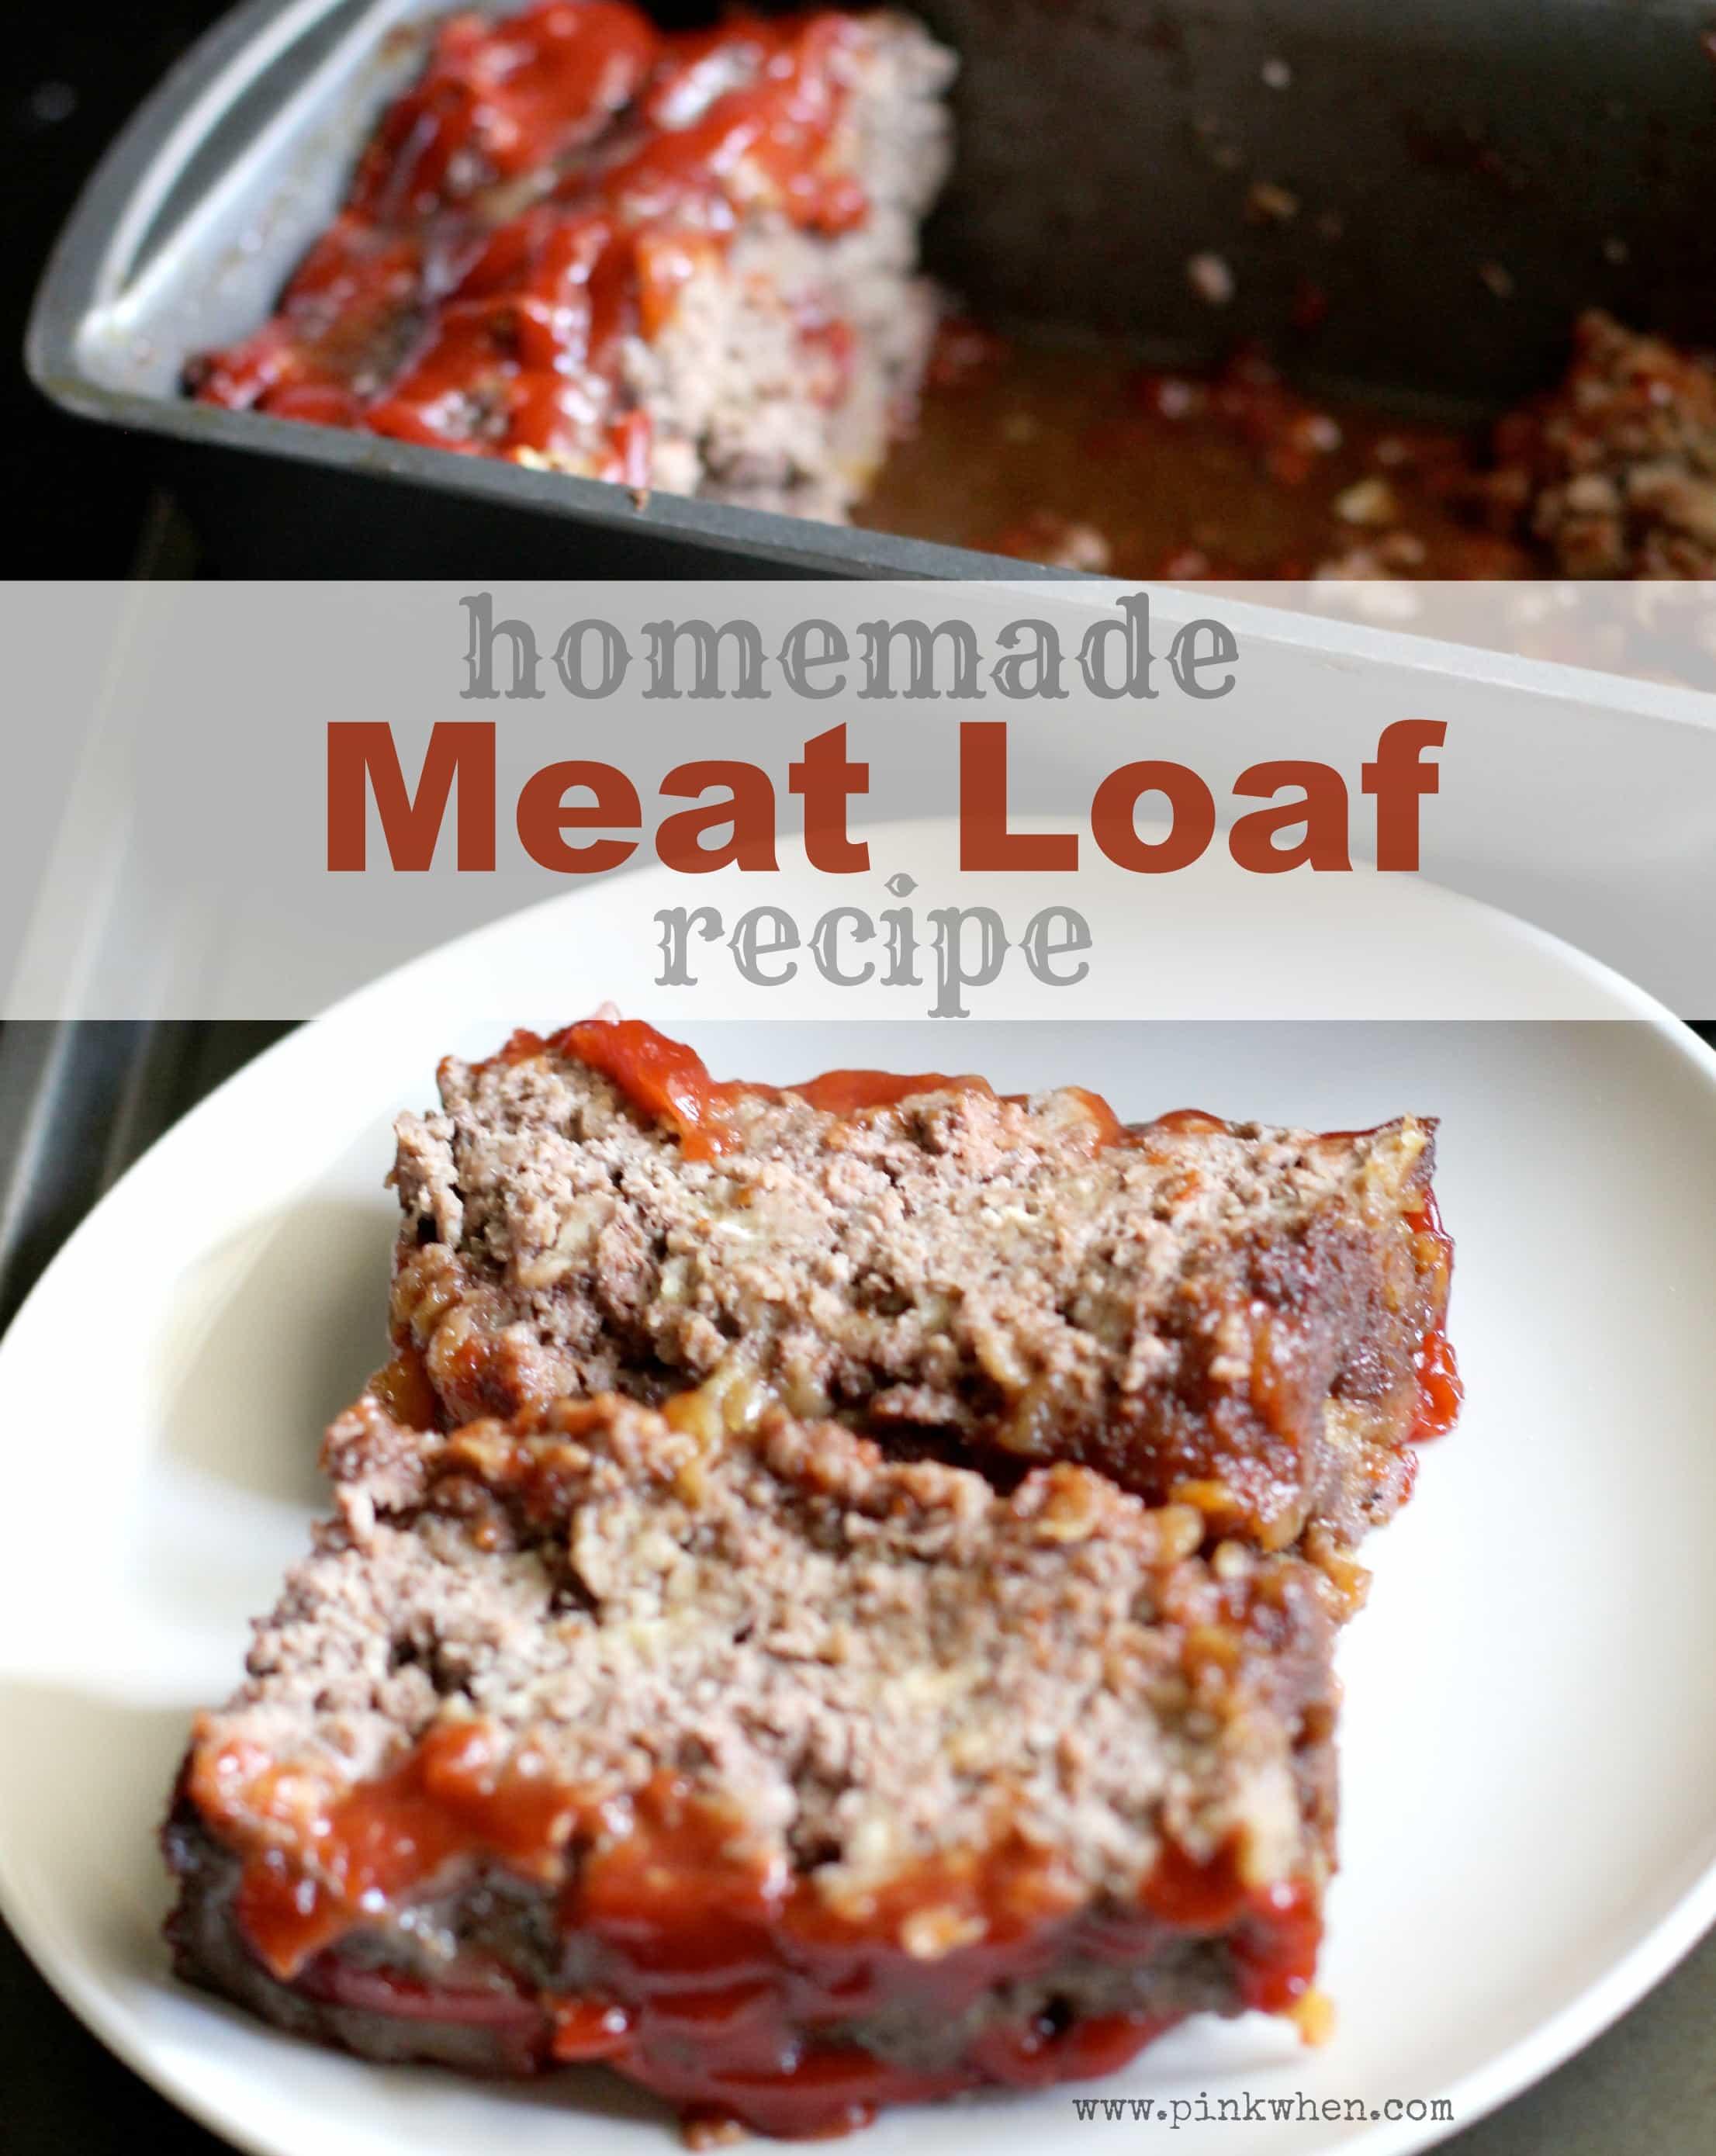 Homemade Brown Sugar Meatloaf Recipe via PinkWhen.com